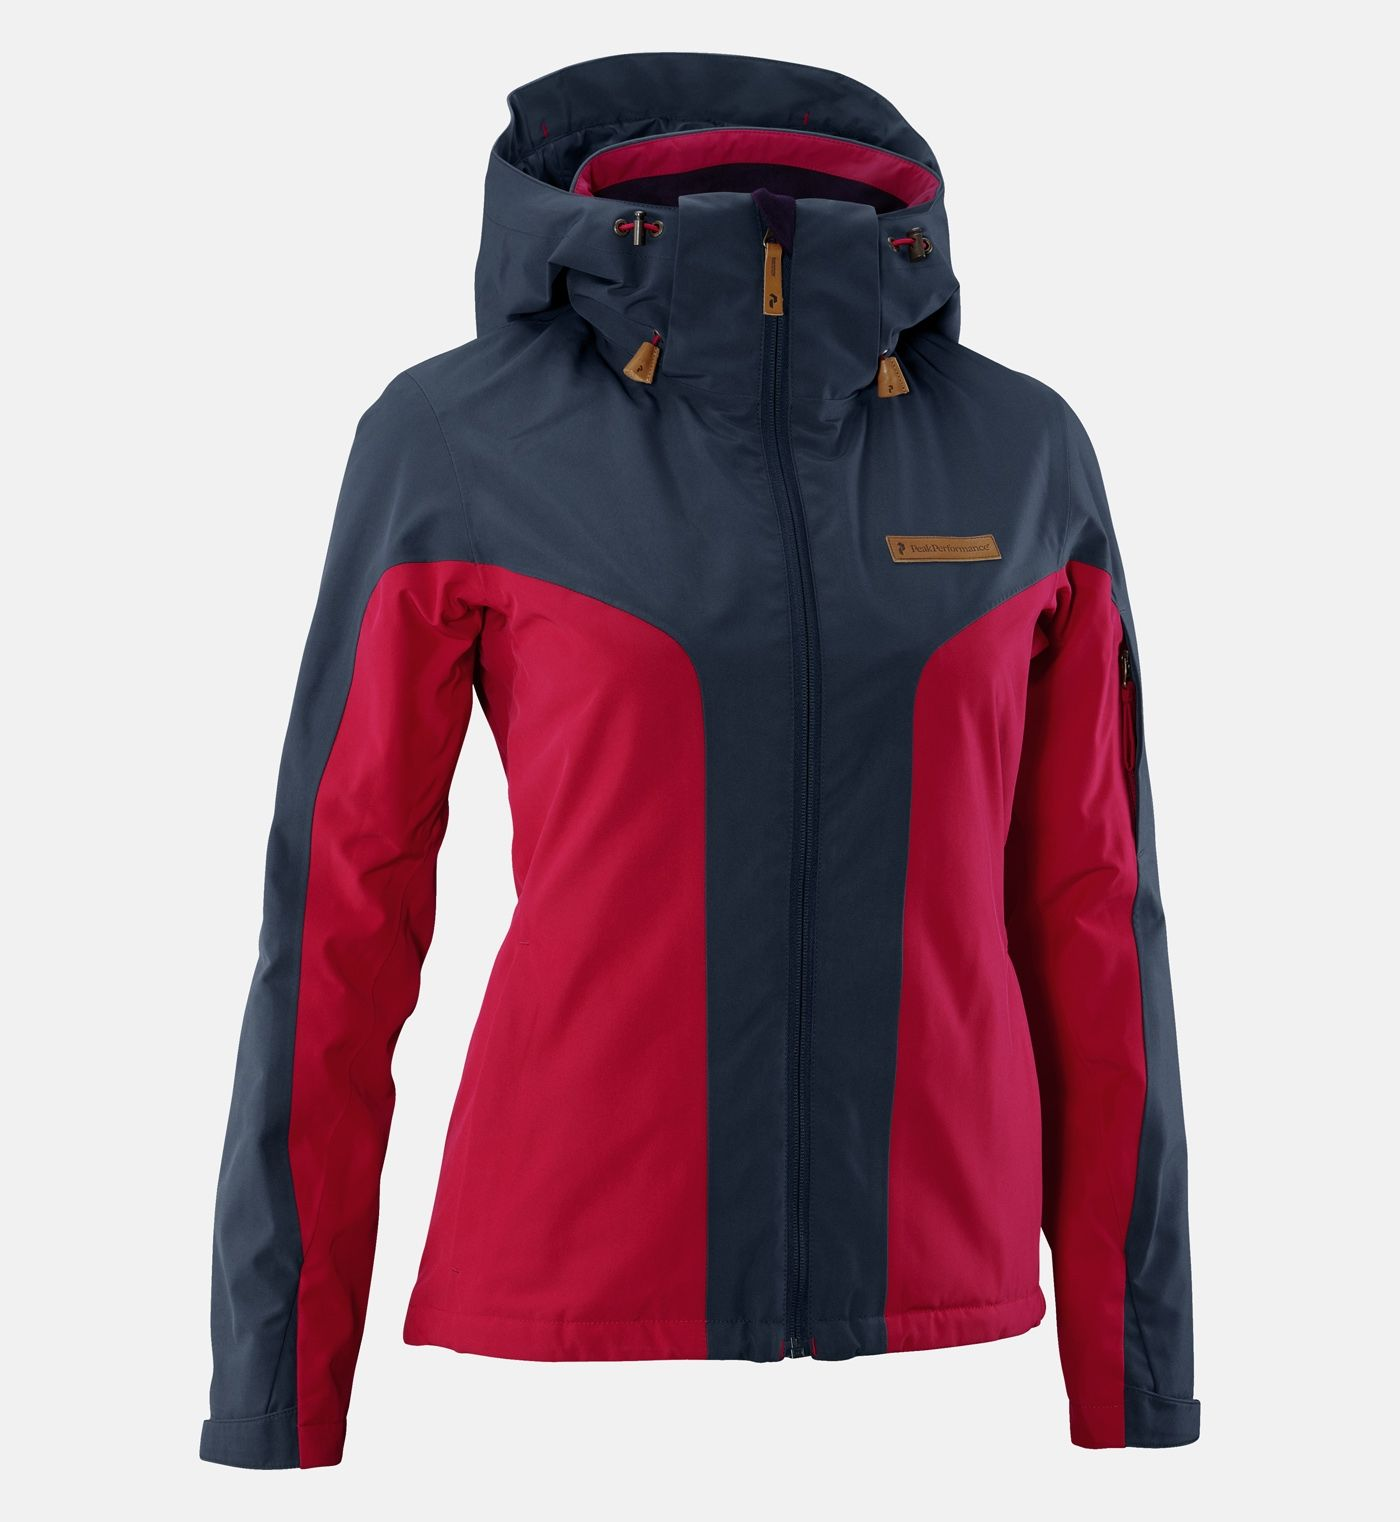 Women's Wear Performance Jacket Active Kendall Uniforme Peak TwTAra4xq